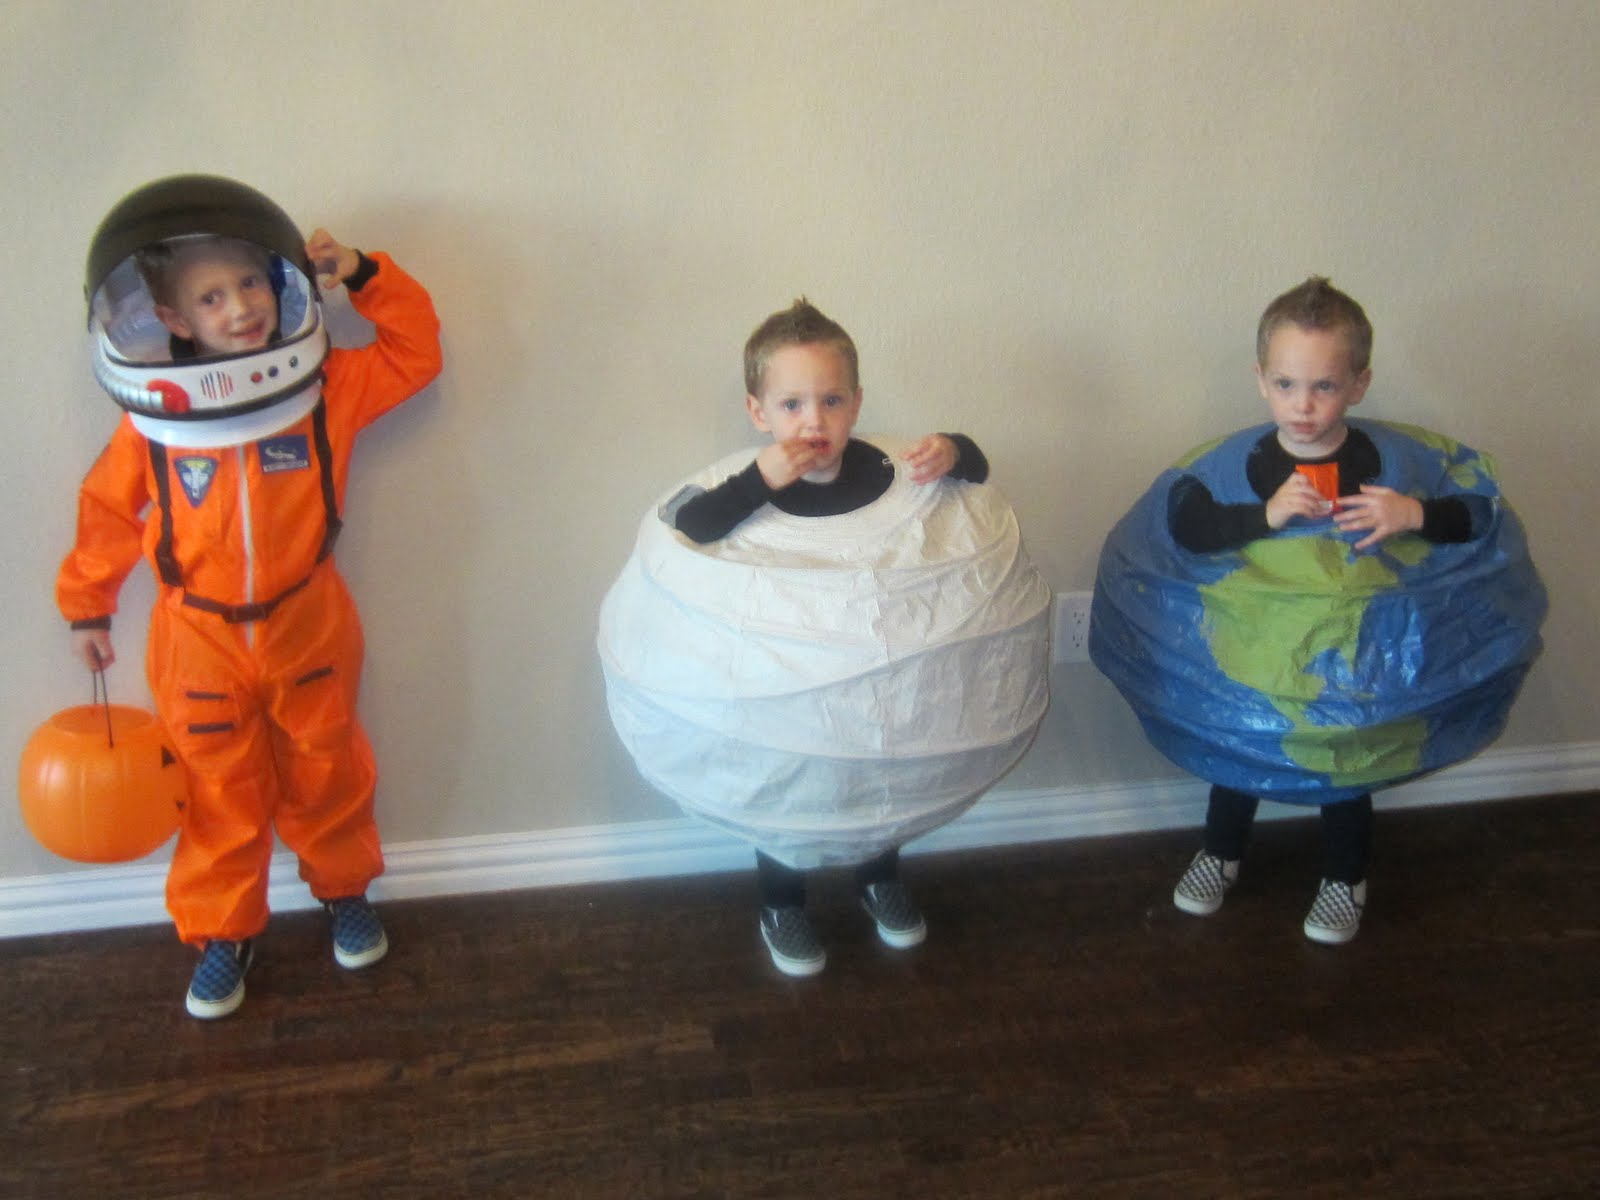 diy solar system dress - photo #22